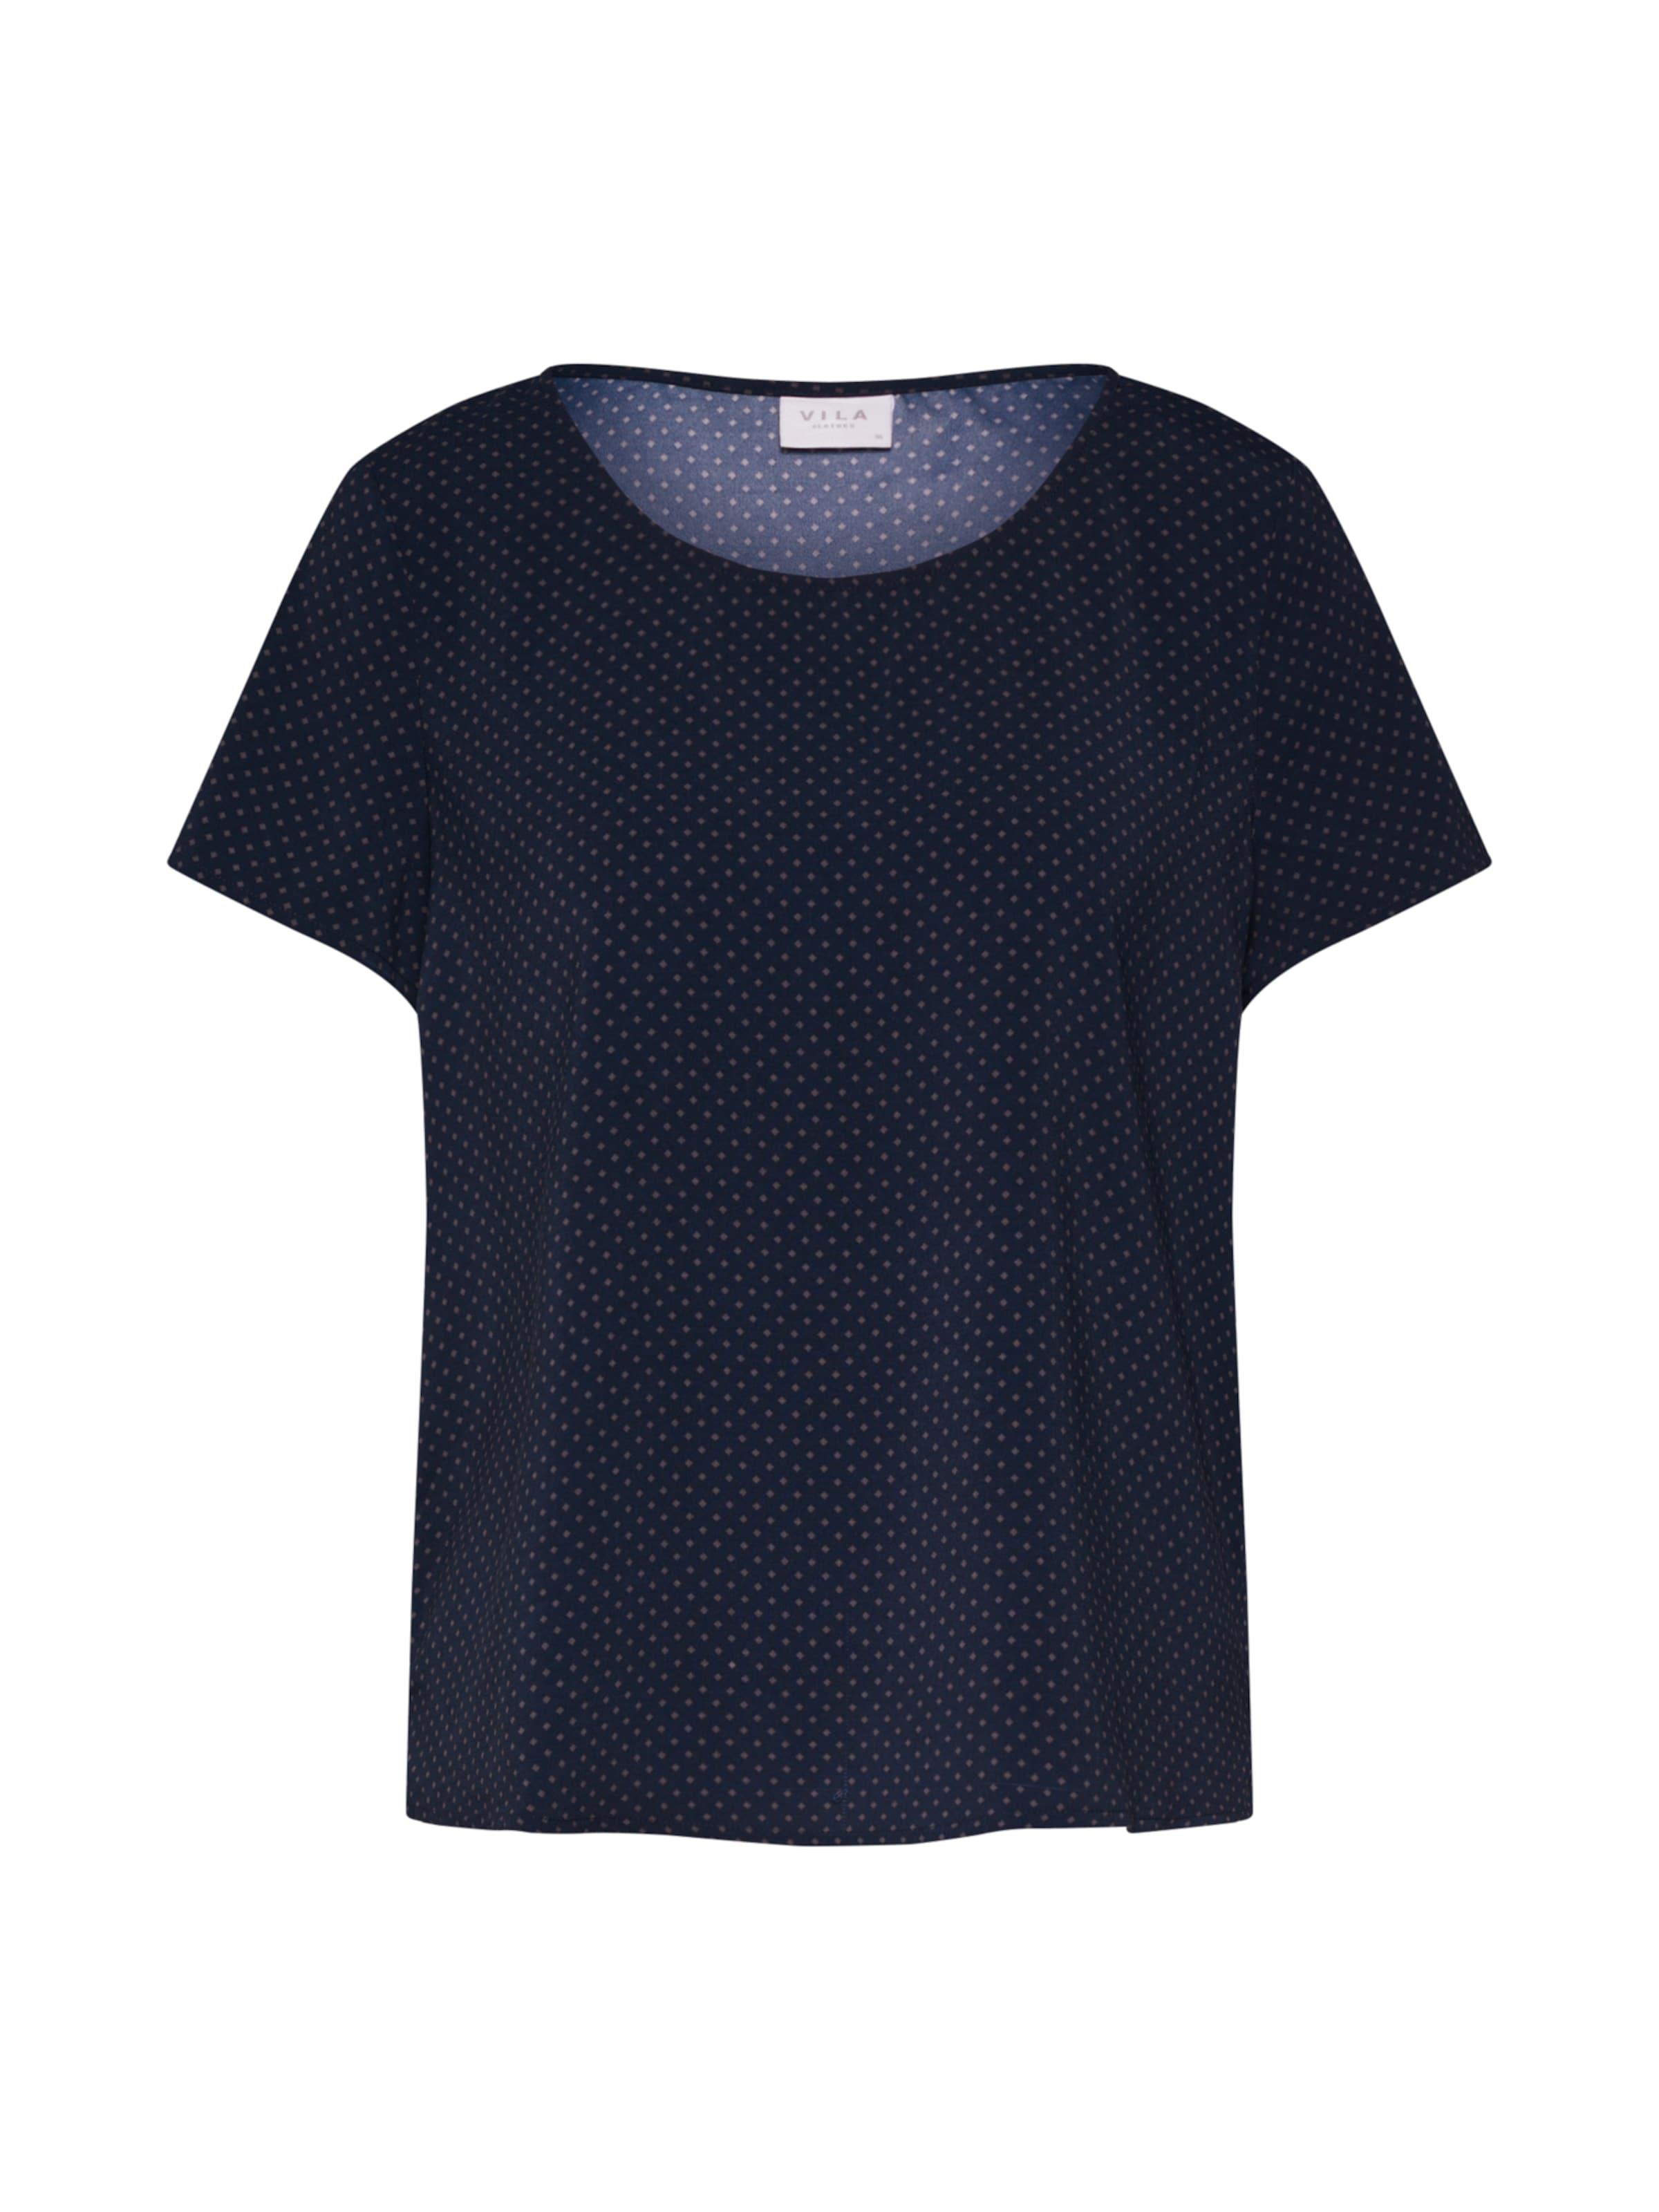 Vila In Kobaltblau Kobaltblau 'laia' Shirt In Shirt Shirt 'laia' In Vila Vila 'laia' UzMpSV